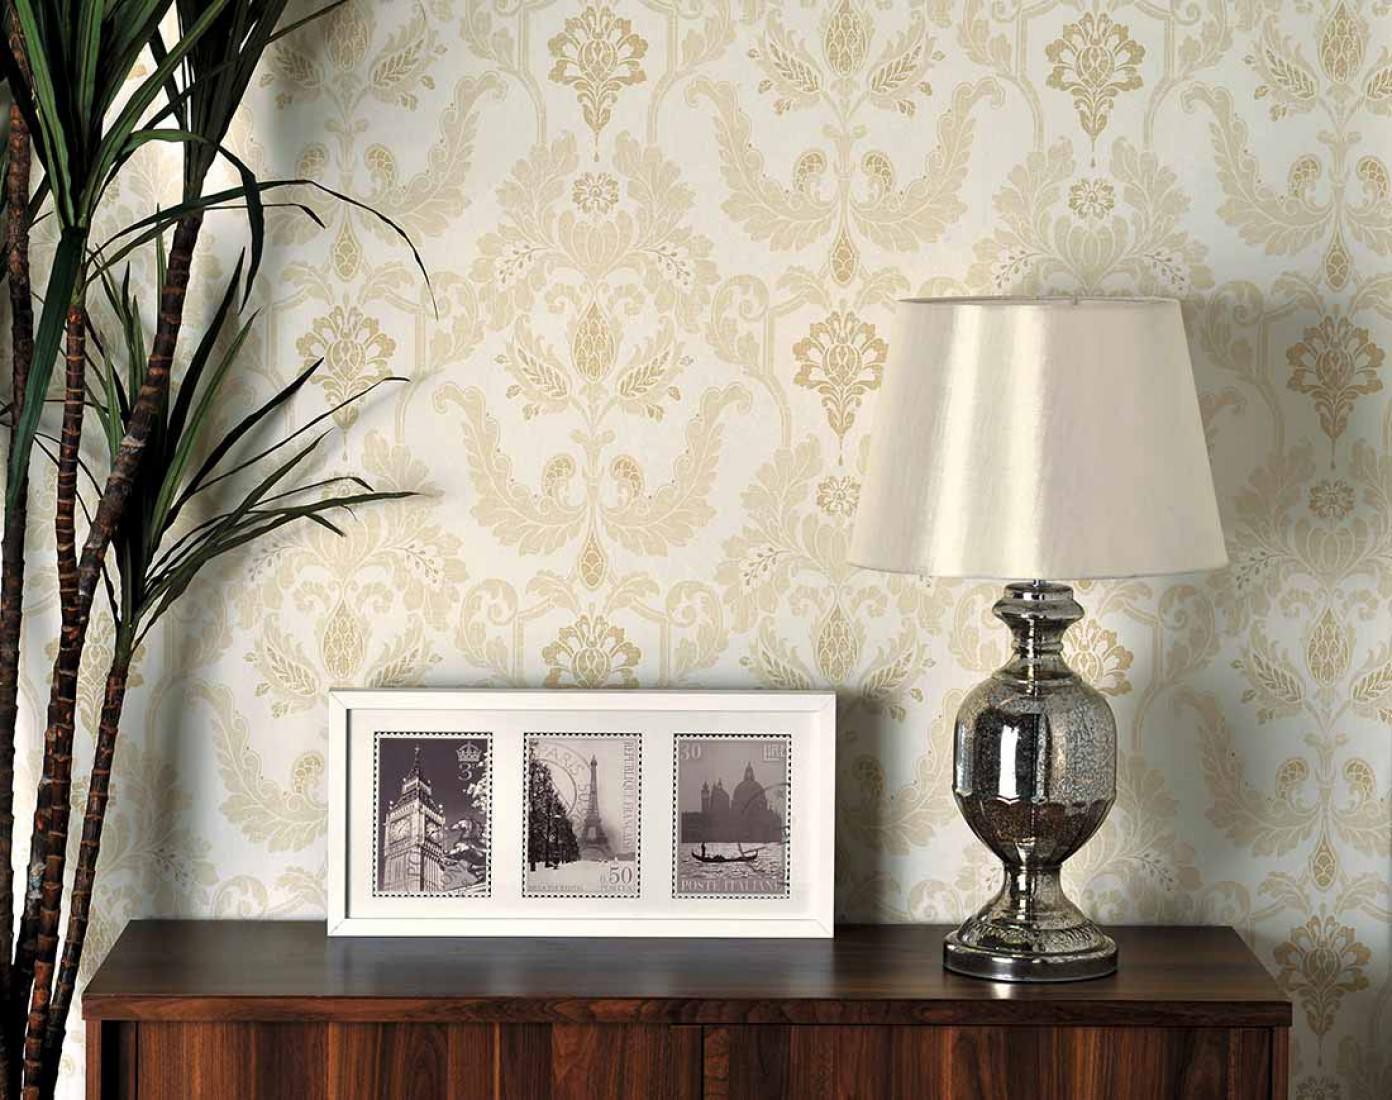 wallpaper livia cream beige pale beige wallpaper. Black Bedroom Furniture Sets. Home Design Ideas